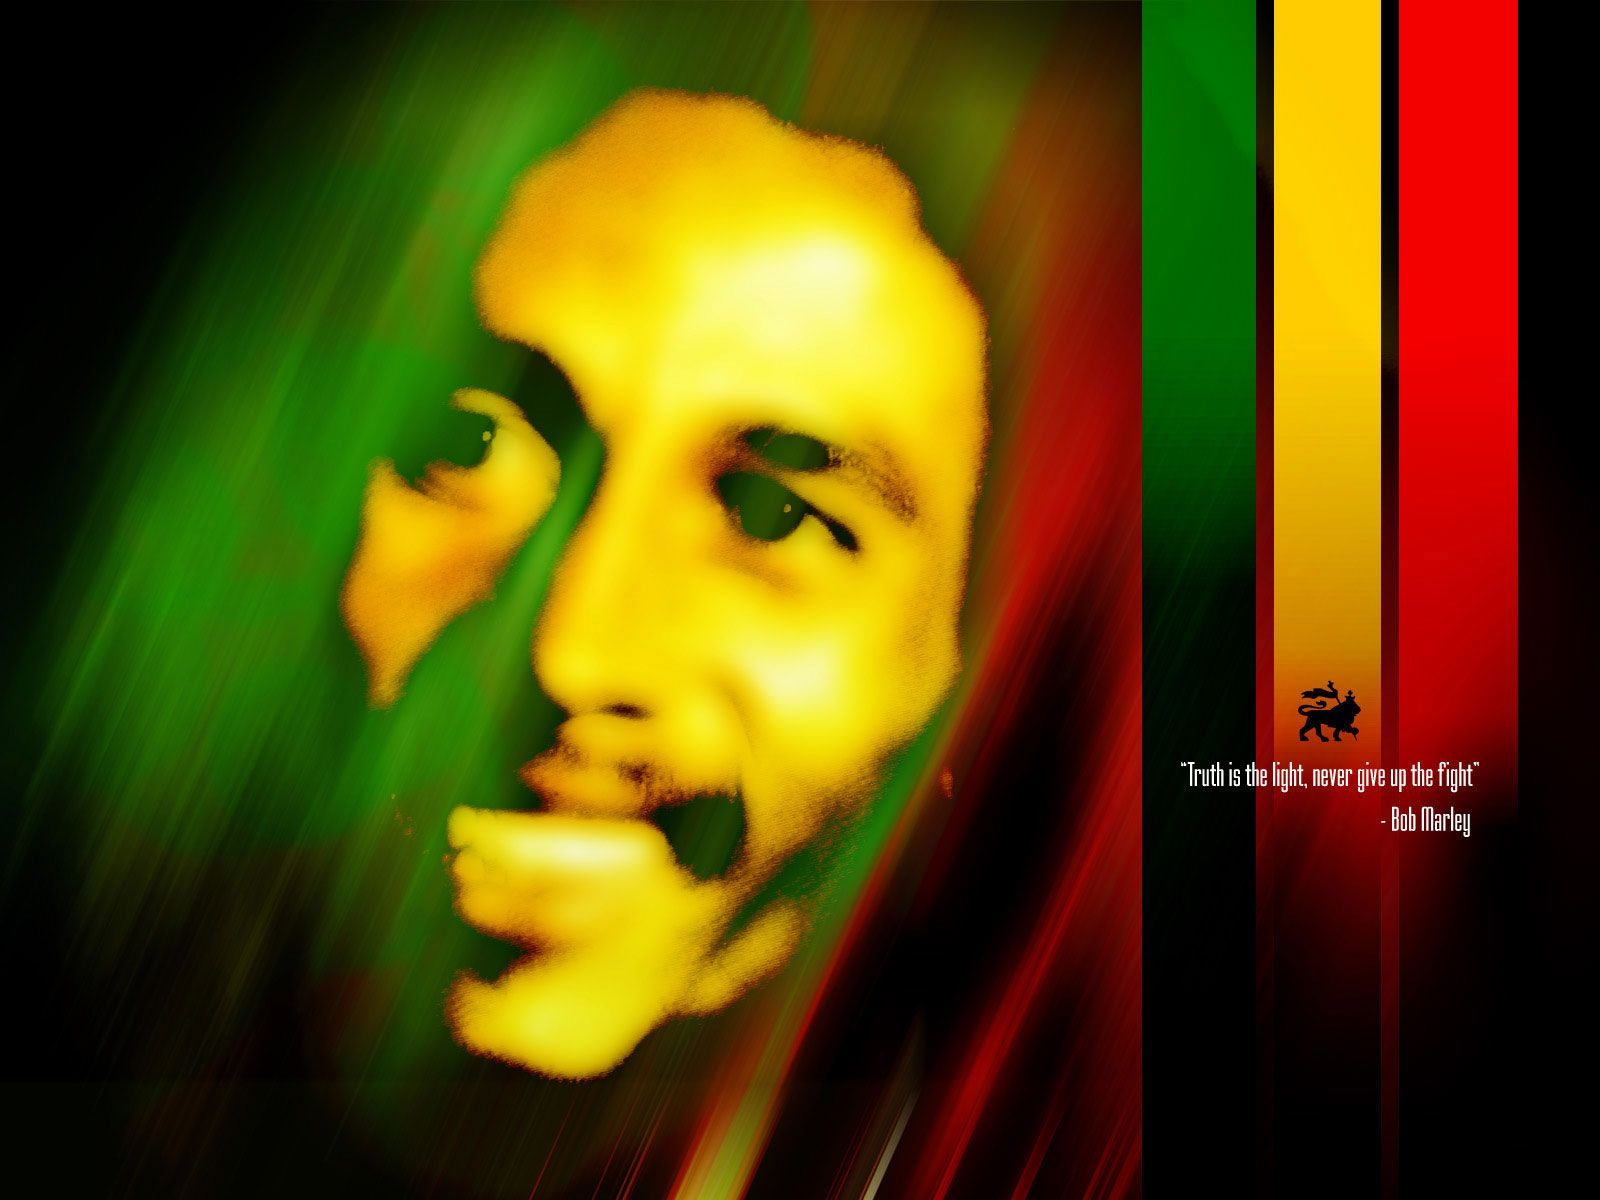 Free Download Marley Wallpaper Bedroom Smoking